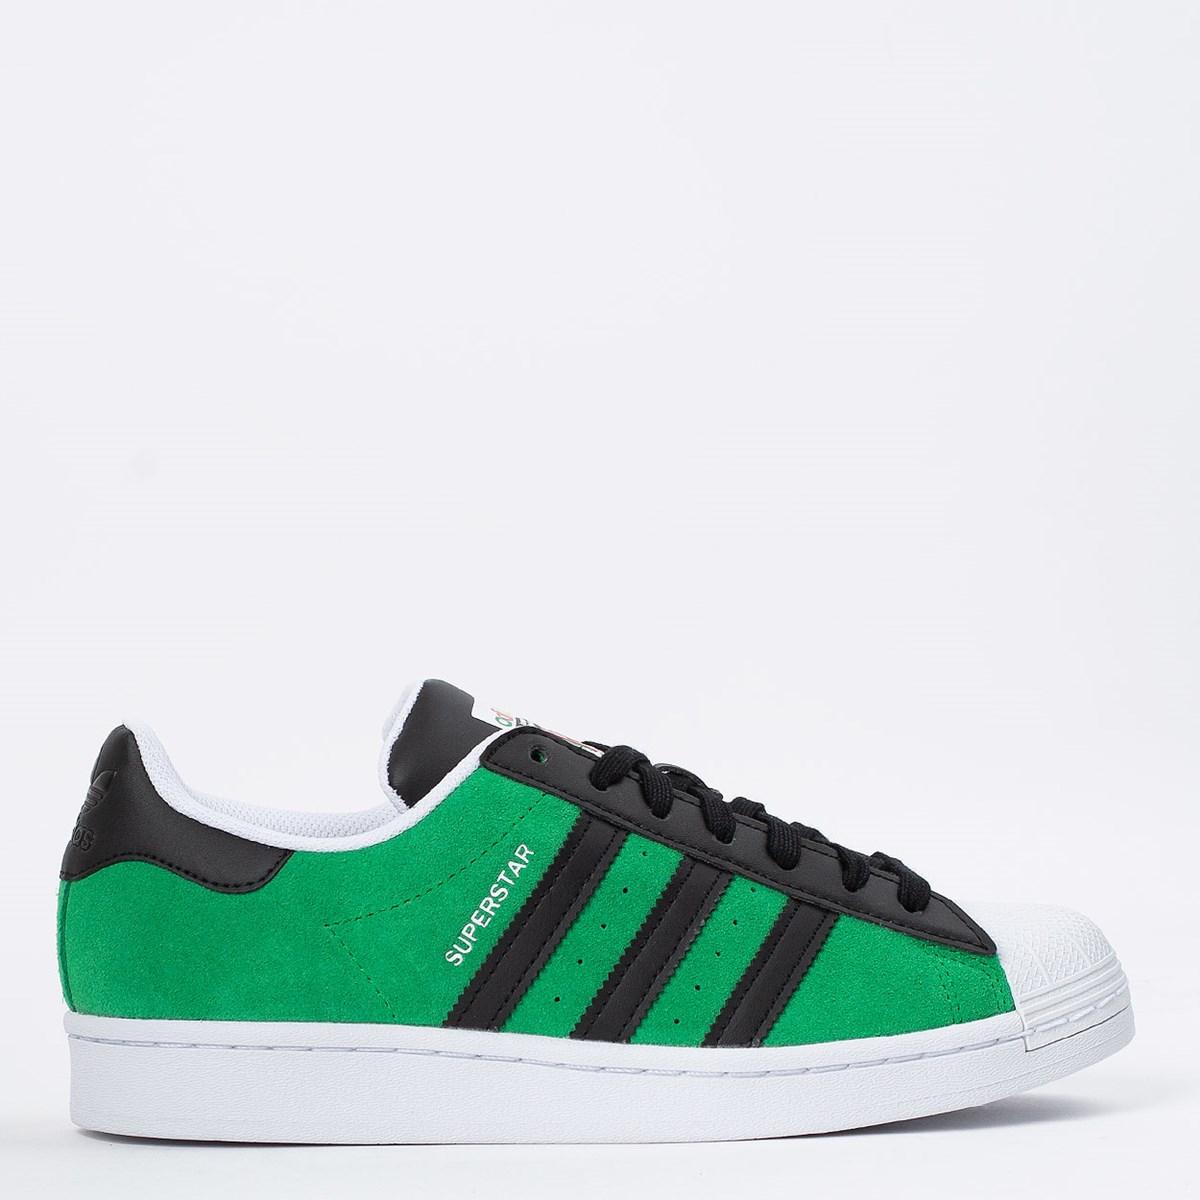 Tênis adidas Superstar Green Core Black FW7844